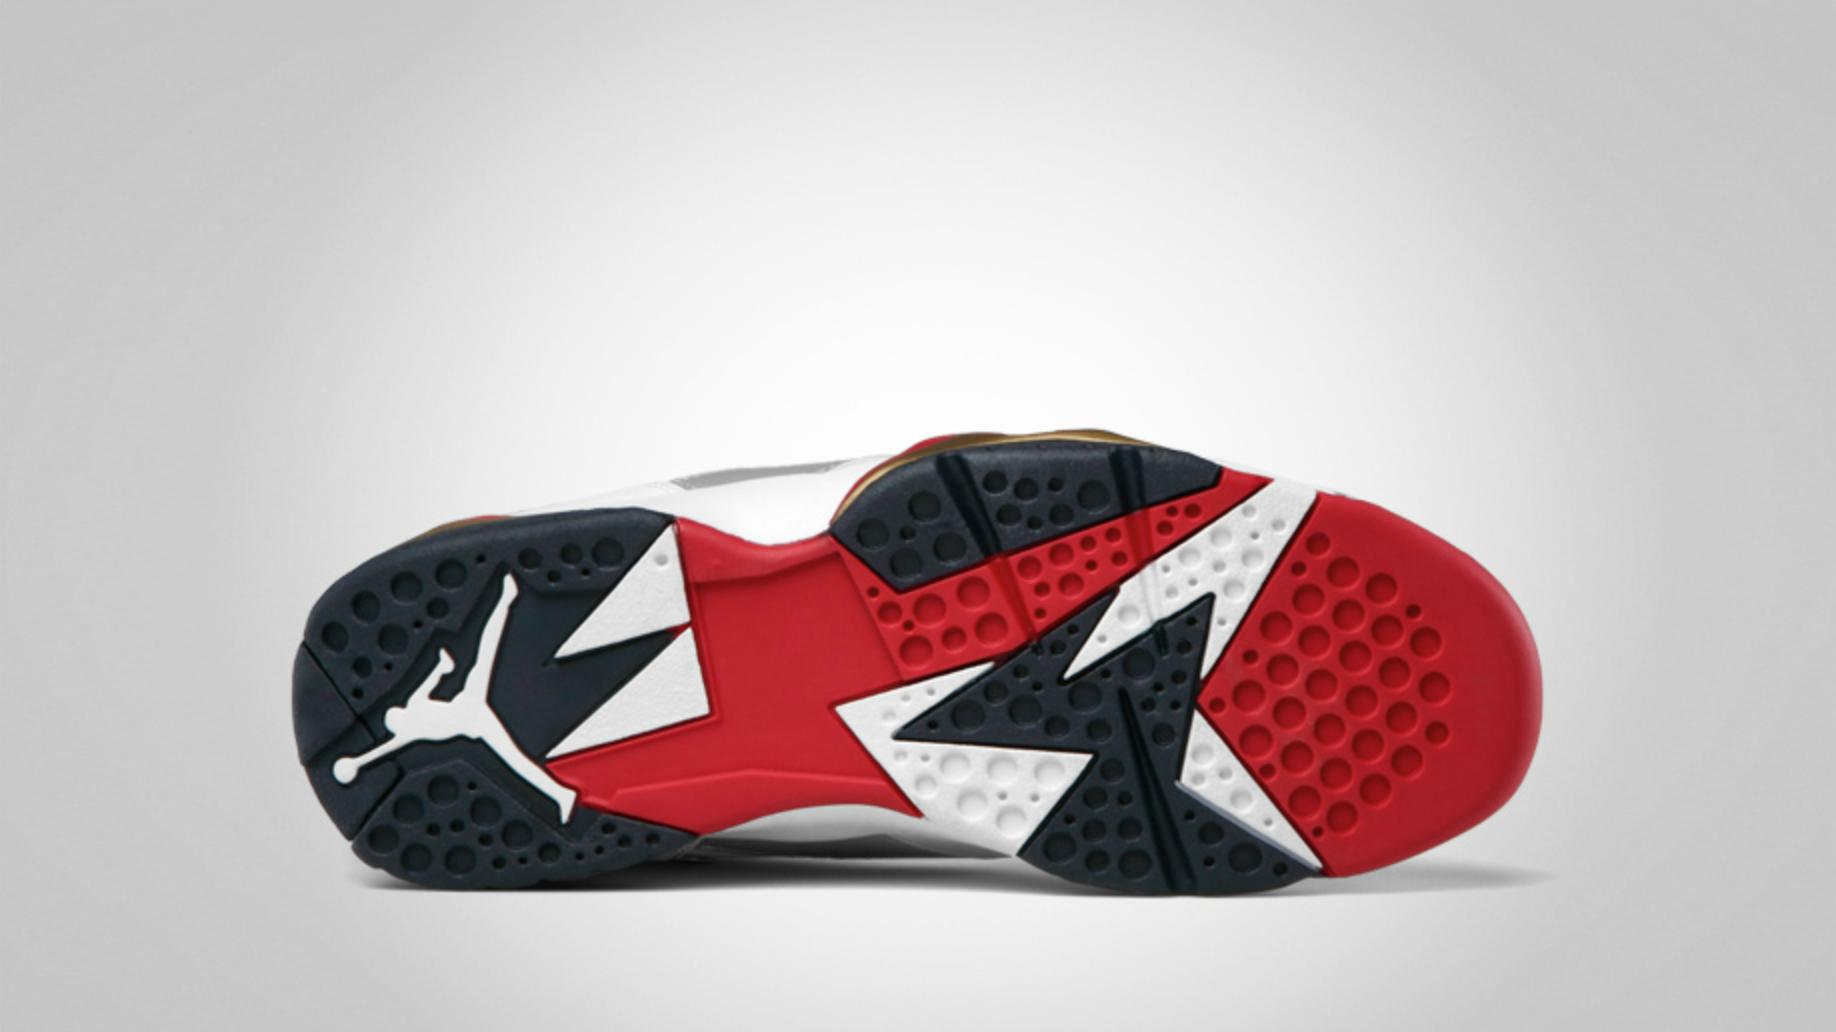 Air Jordan 7 'Olympic' - Official Images